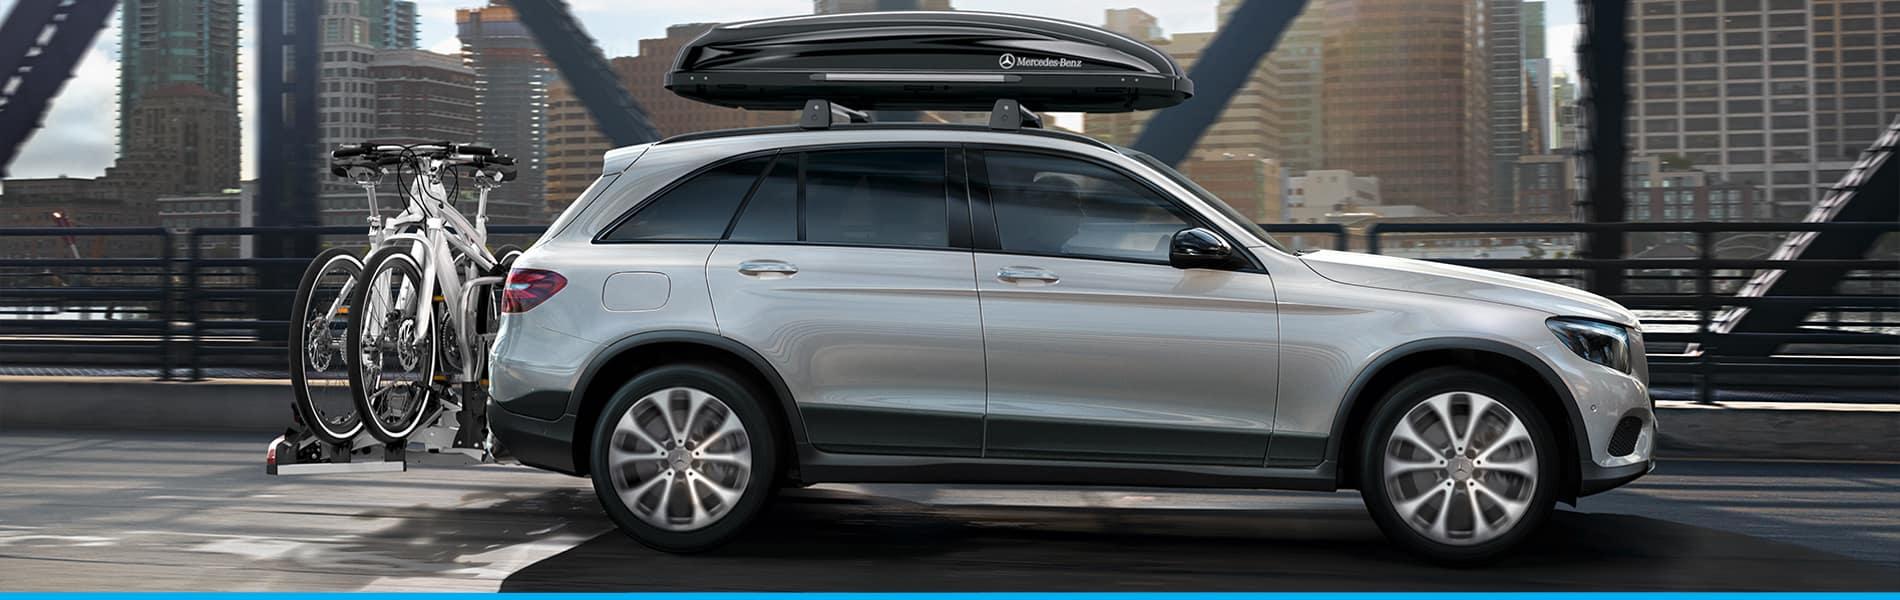 Mercedes Benz Accessories >> Owners Genuine Accessories Mercedes Benz Toronto Retail